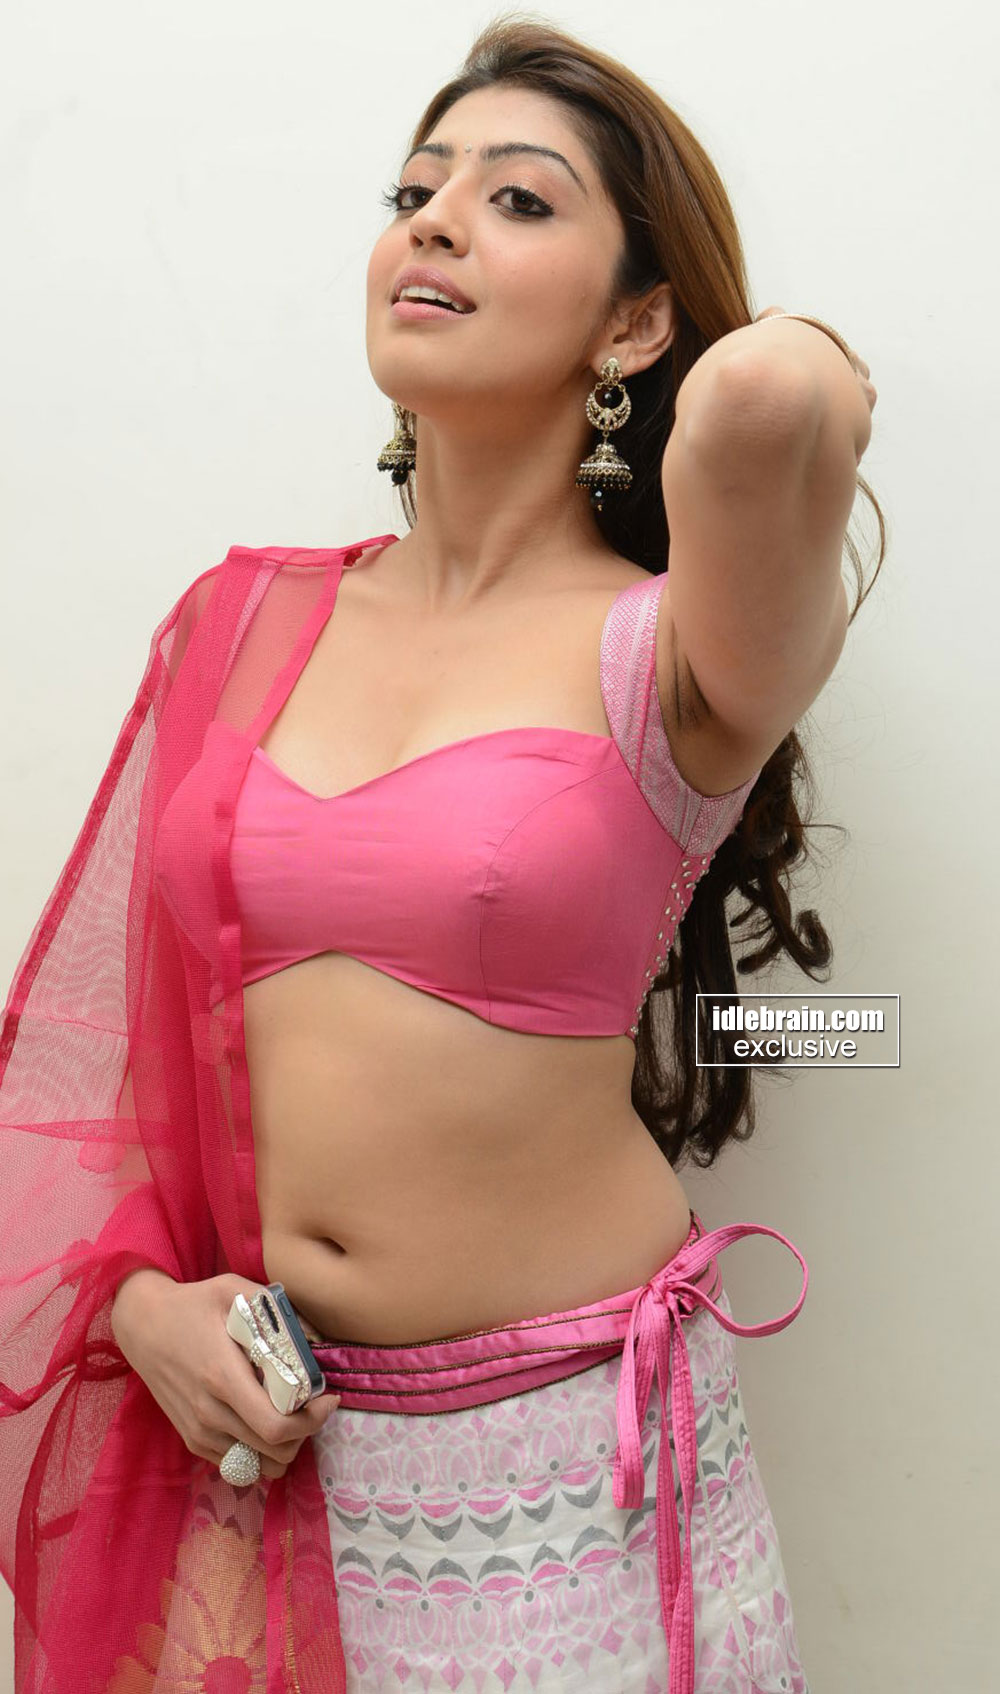 Beautiful Girl Wallpaper Santa Banta Sexy Navel Hole Of Indian Desi Girls Hot Celebrity